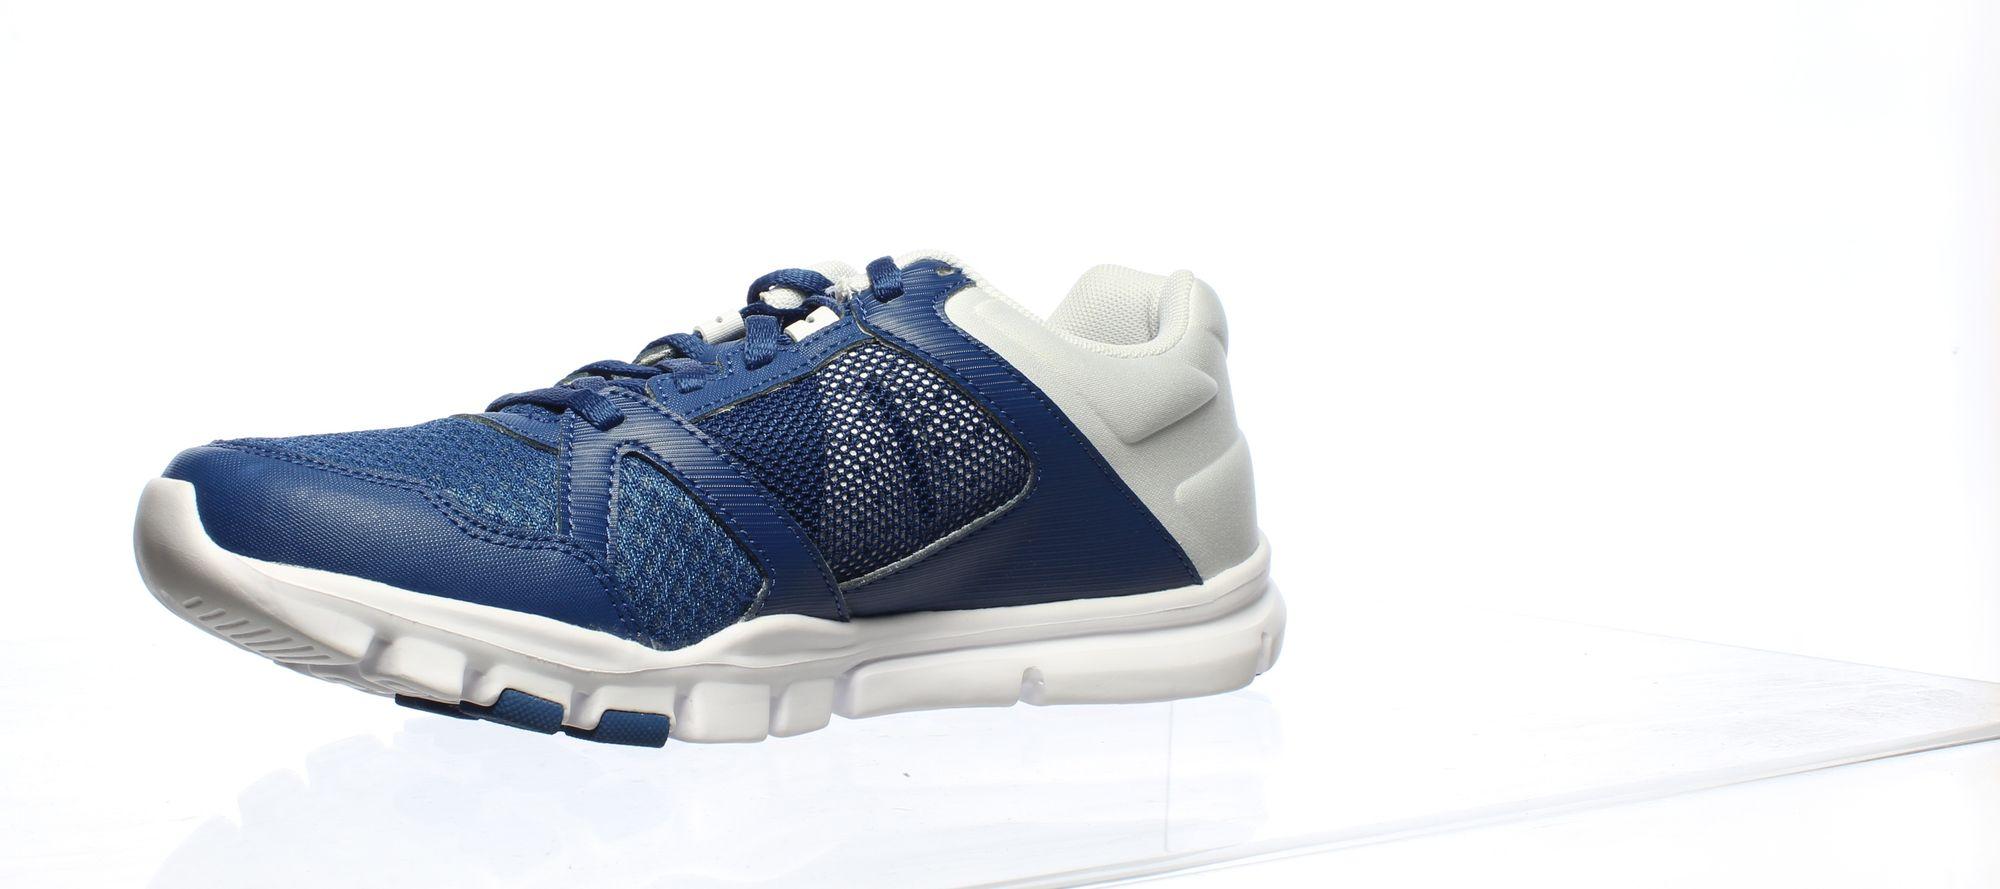 Reebok-Mens-Yourflex-Train-10-Cross-Training-Shoes miniature 9